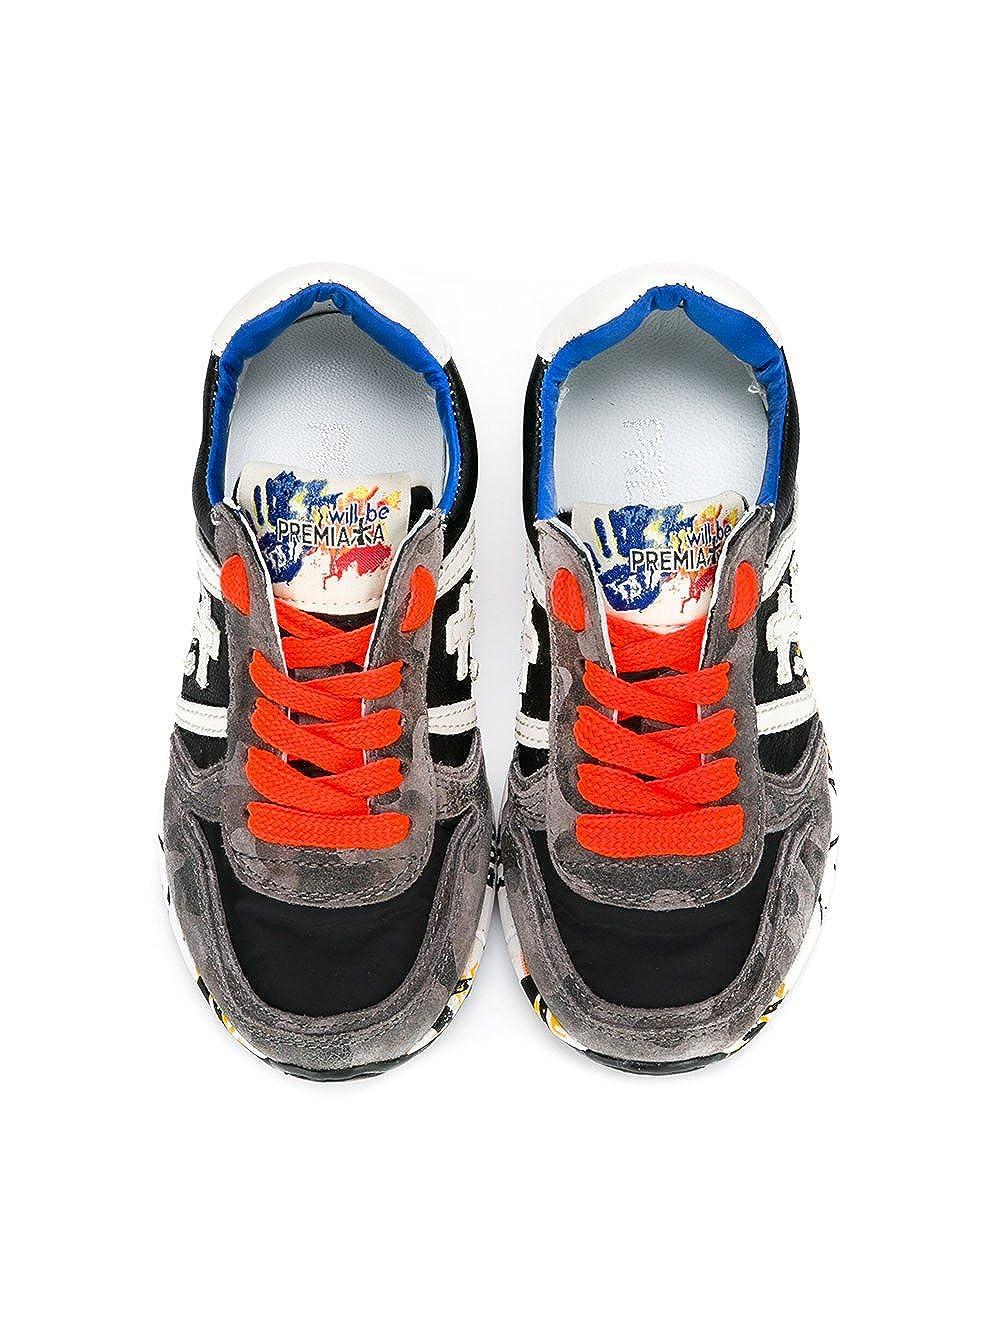 E Sky itScarpe Bambino 063232Amazon Borse Premiata Sneaker ZTkXiuPO